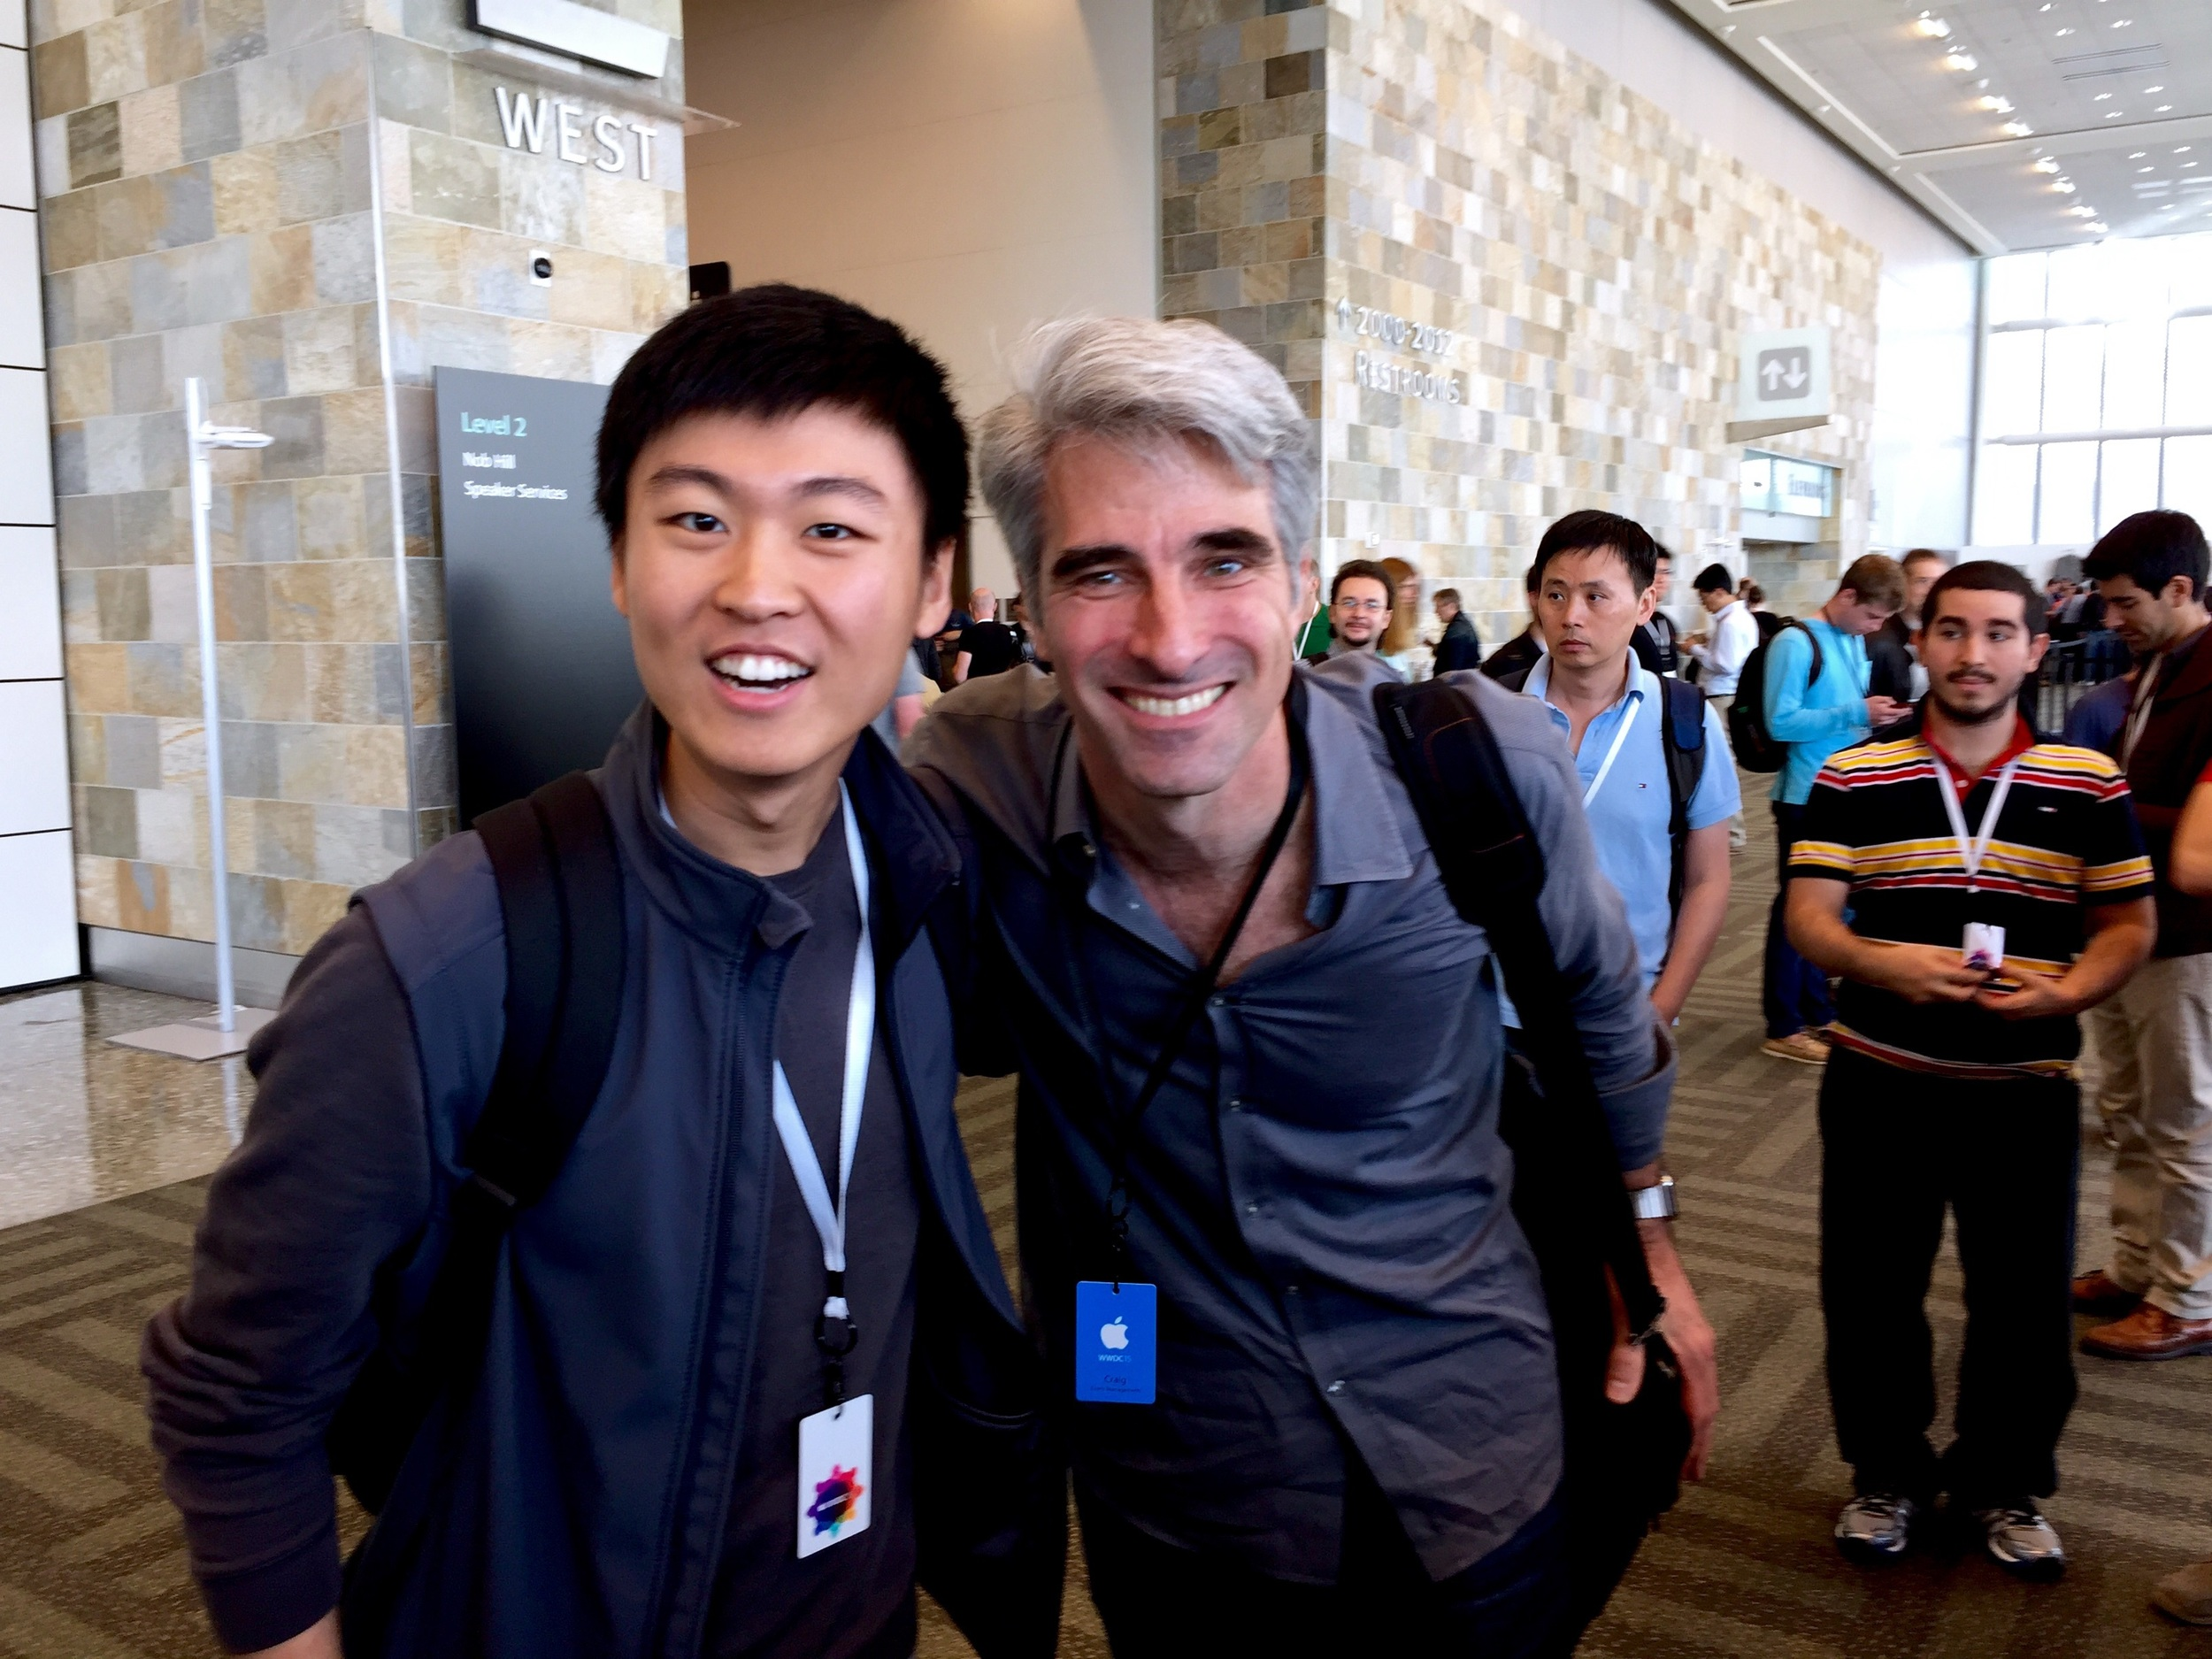 Clarence & Craig Federighi (Apple's senior VP of Software Engineering)